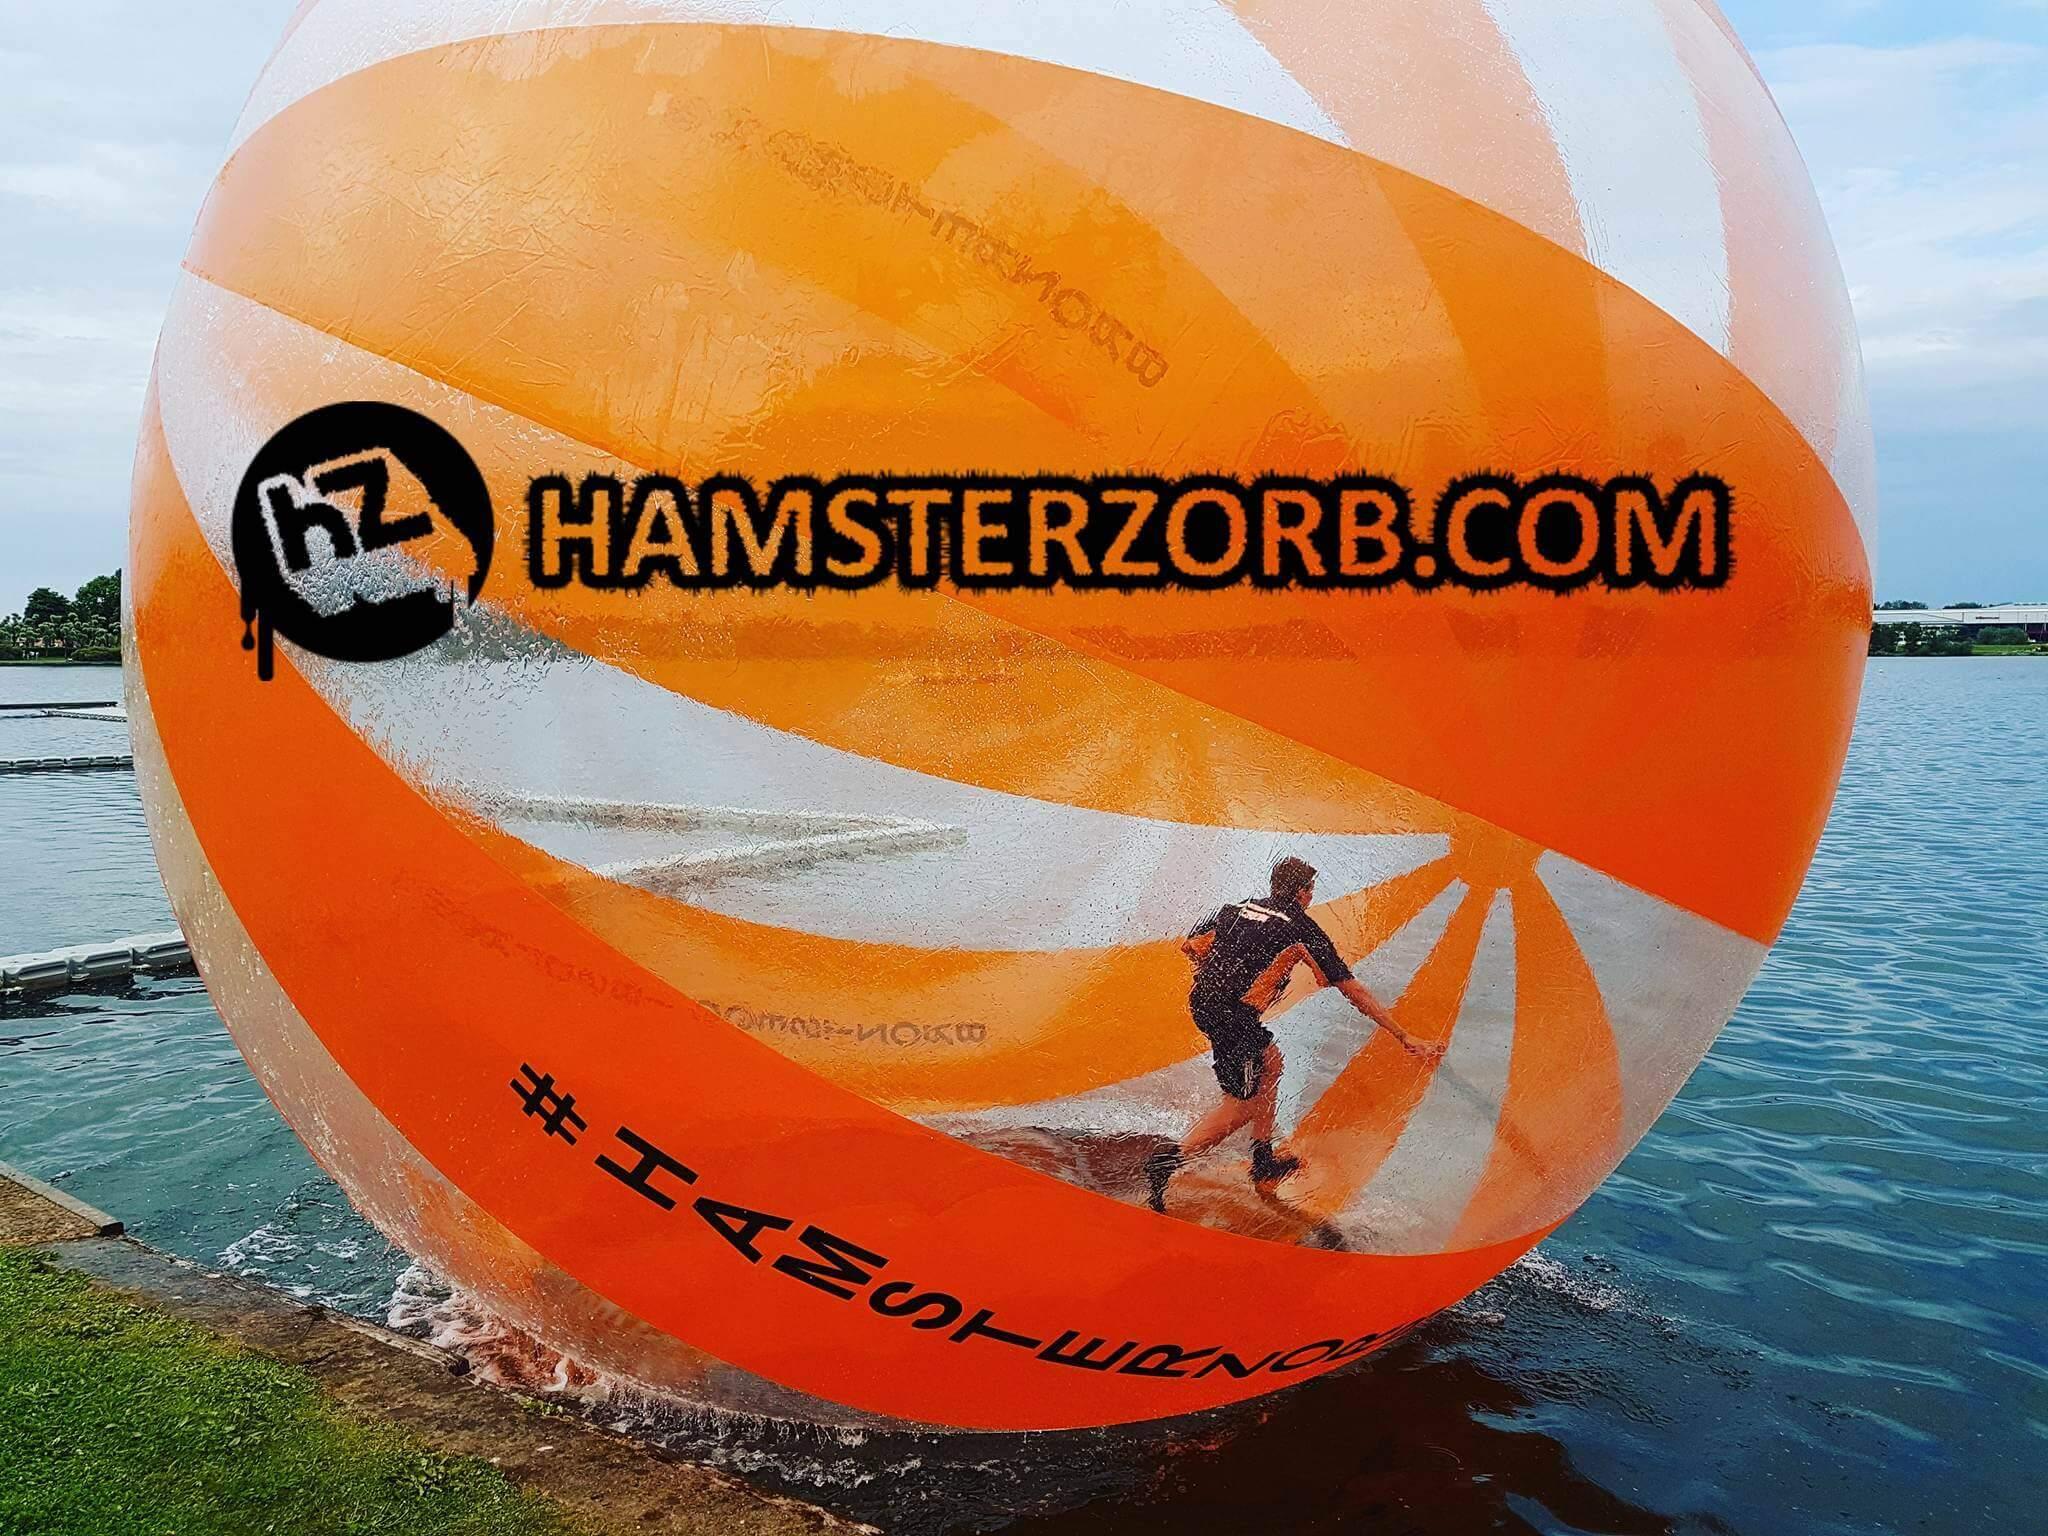 Hamsterzorb ball